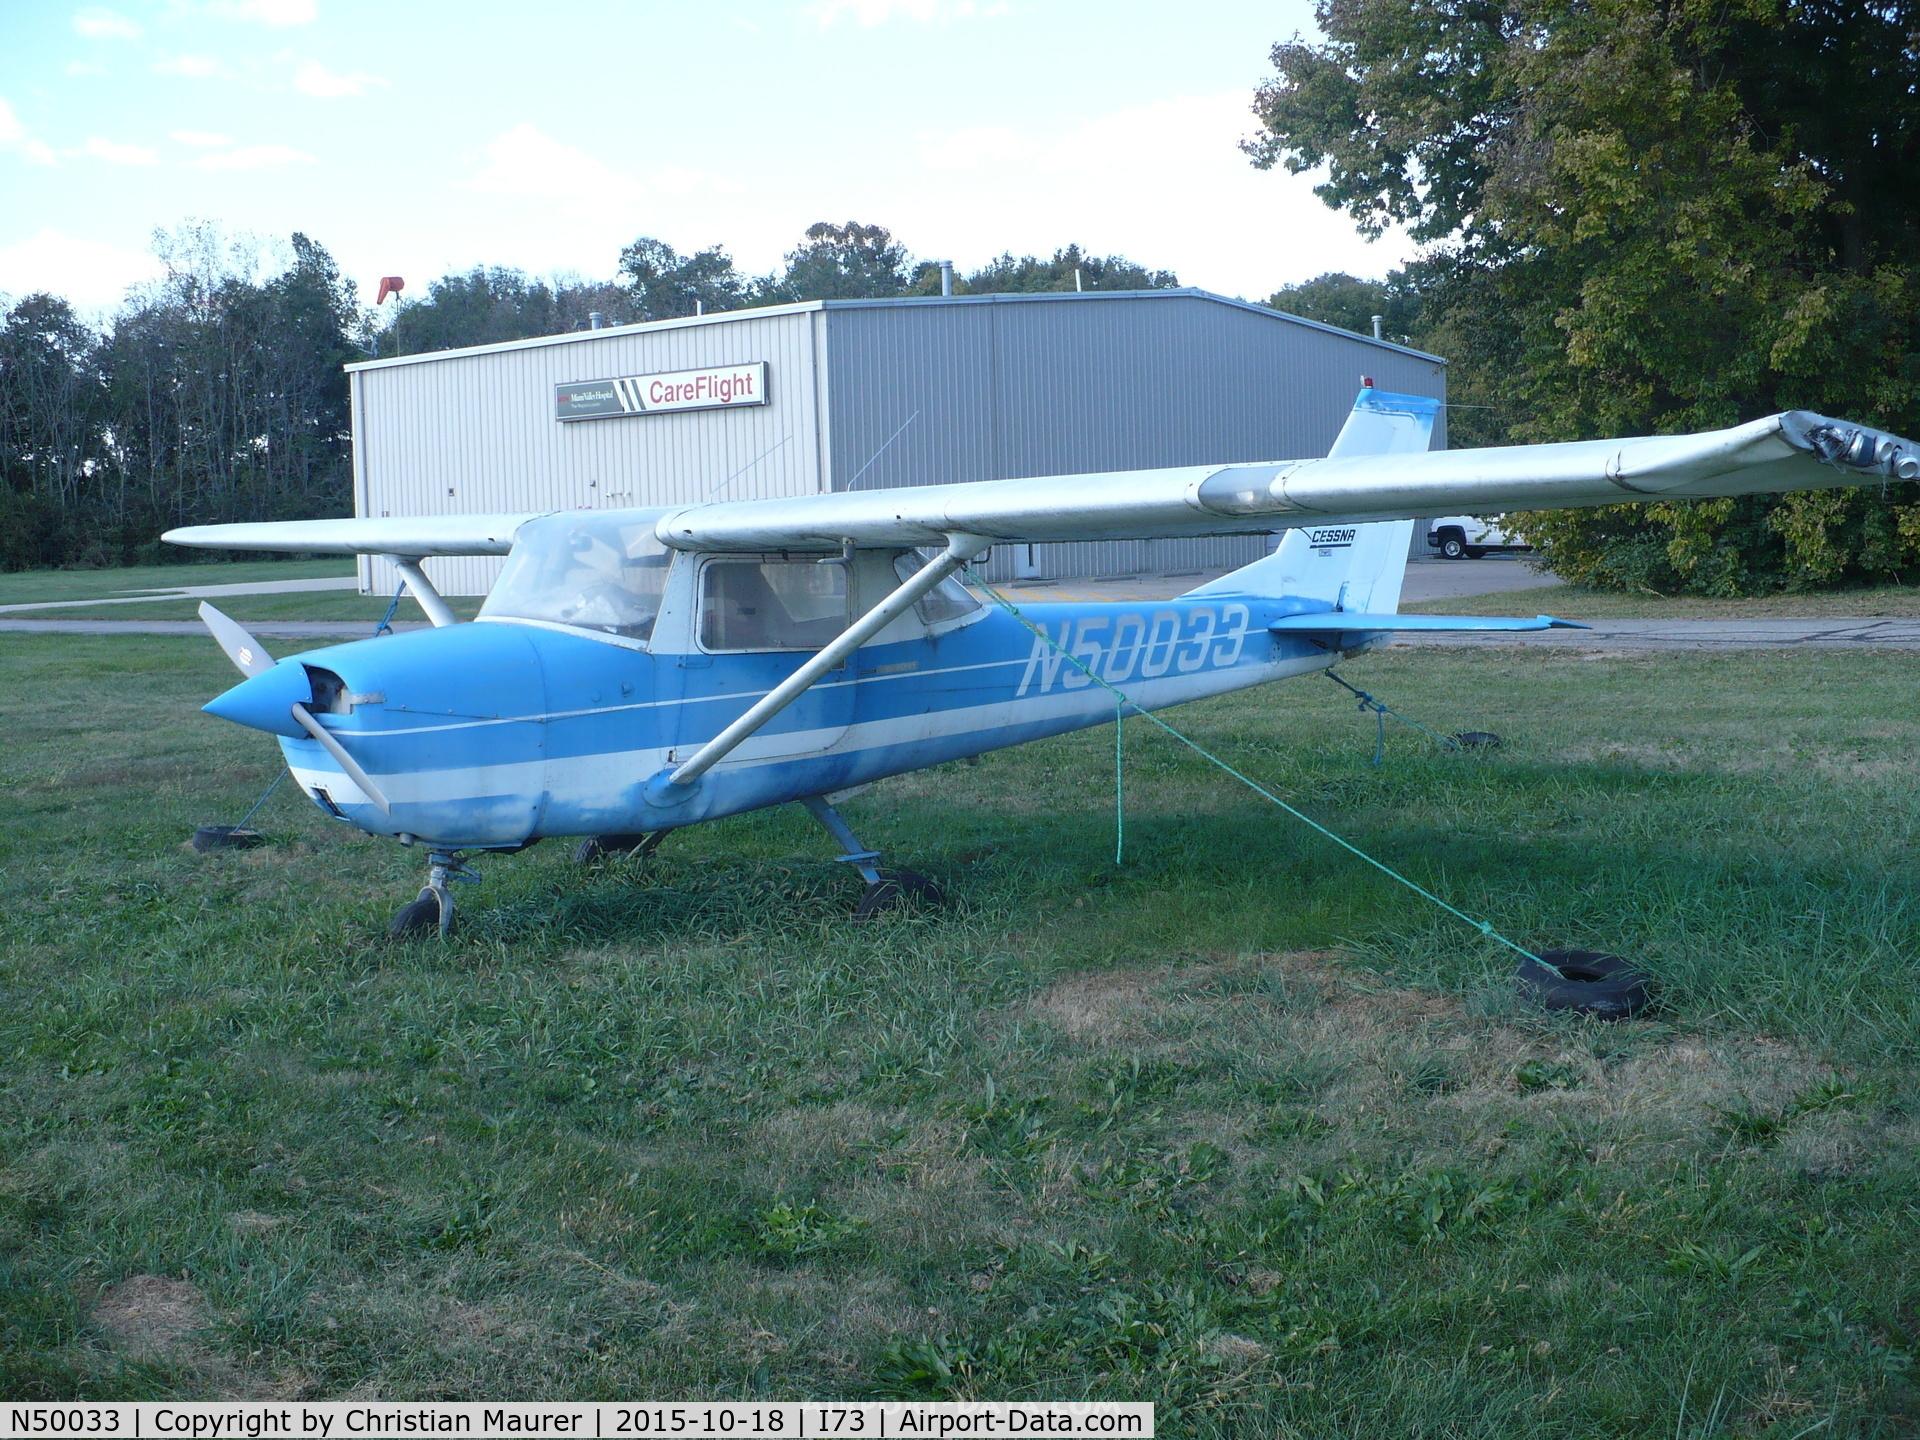 N50033, 1968 Cessna 150H C/N 15069024, Cessna 150H